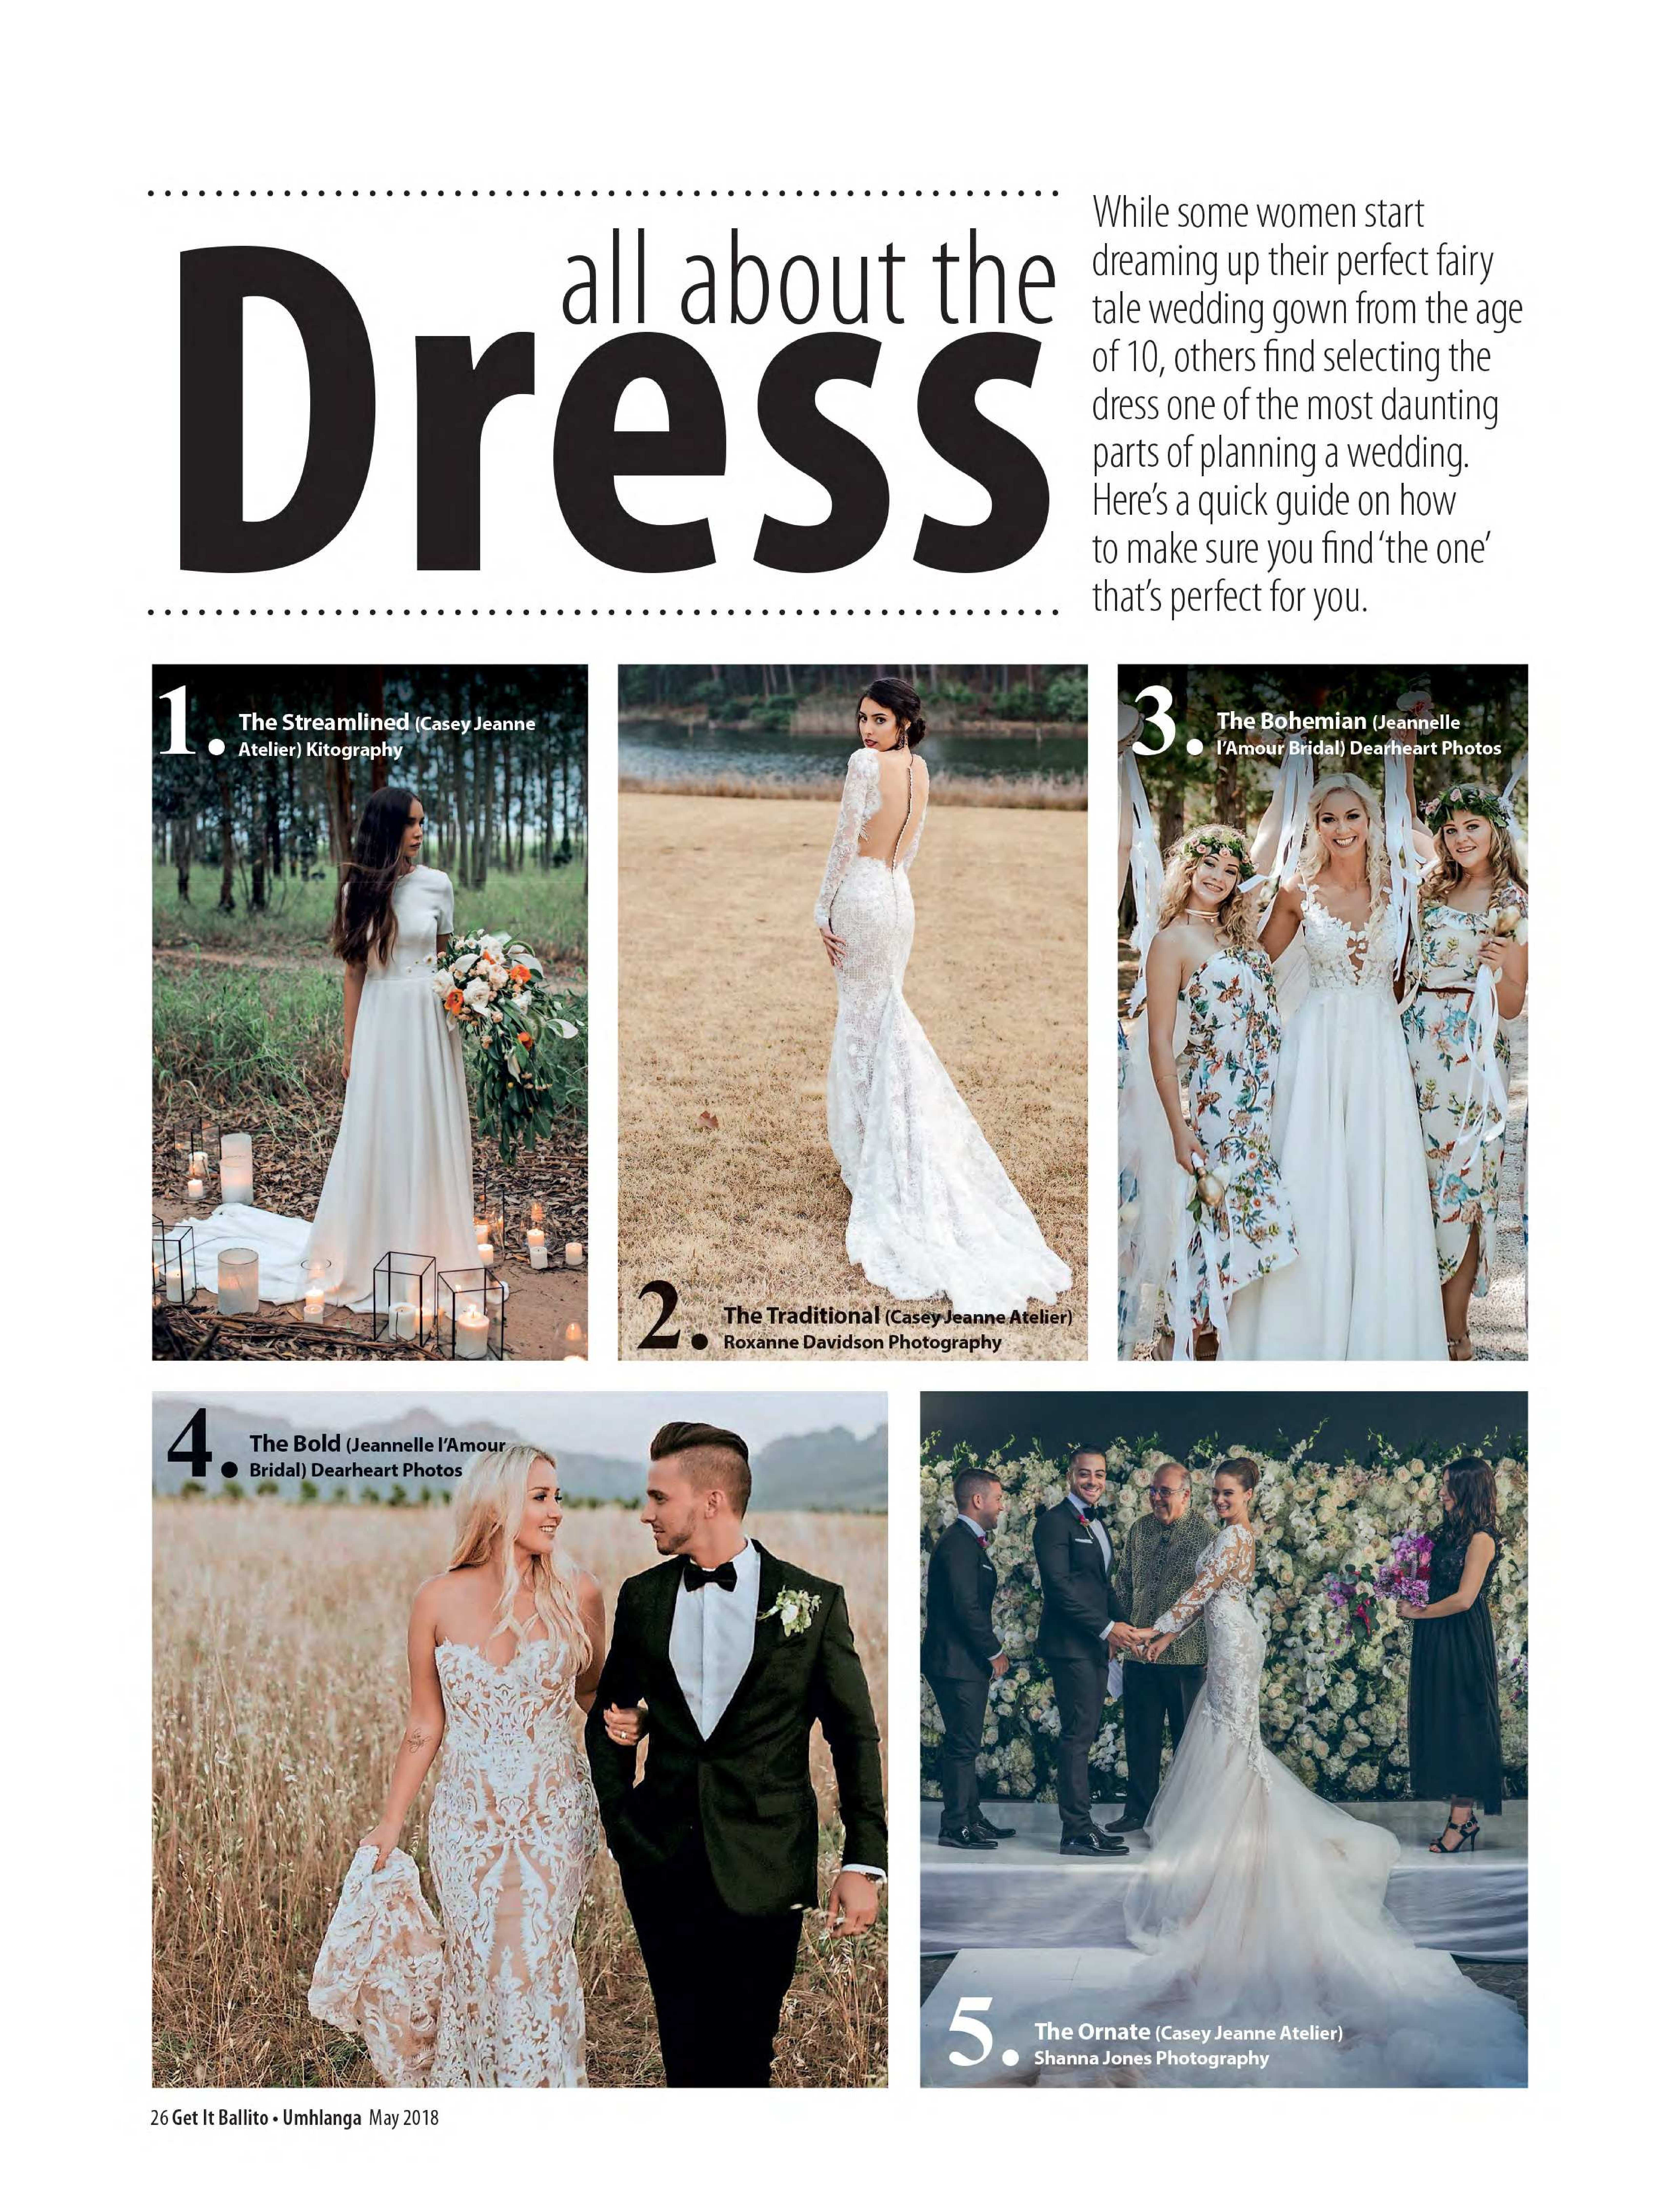 get-magazine-ballitoumhlanga-may-2018-epapers-page-28